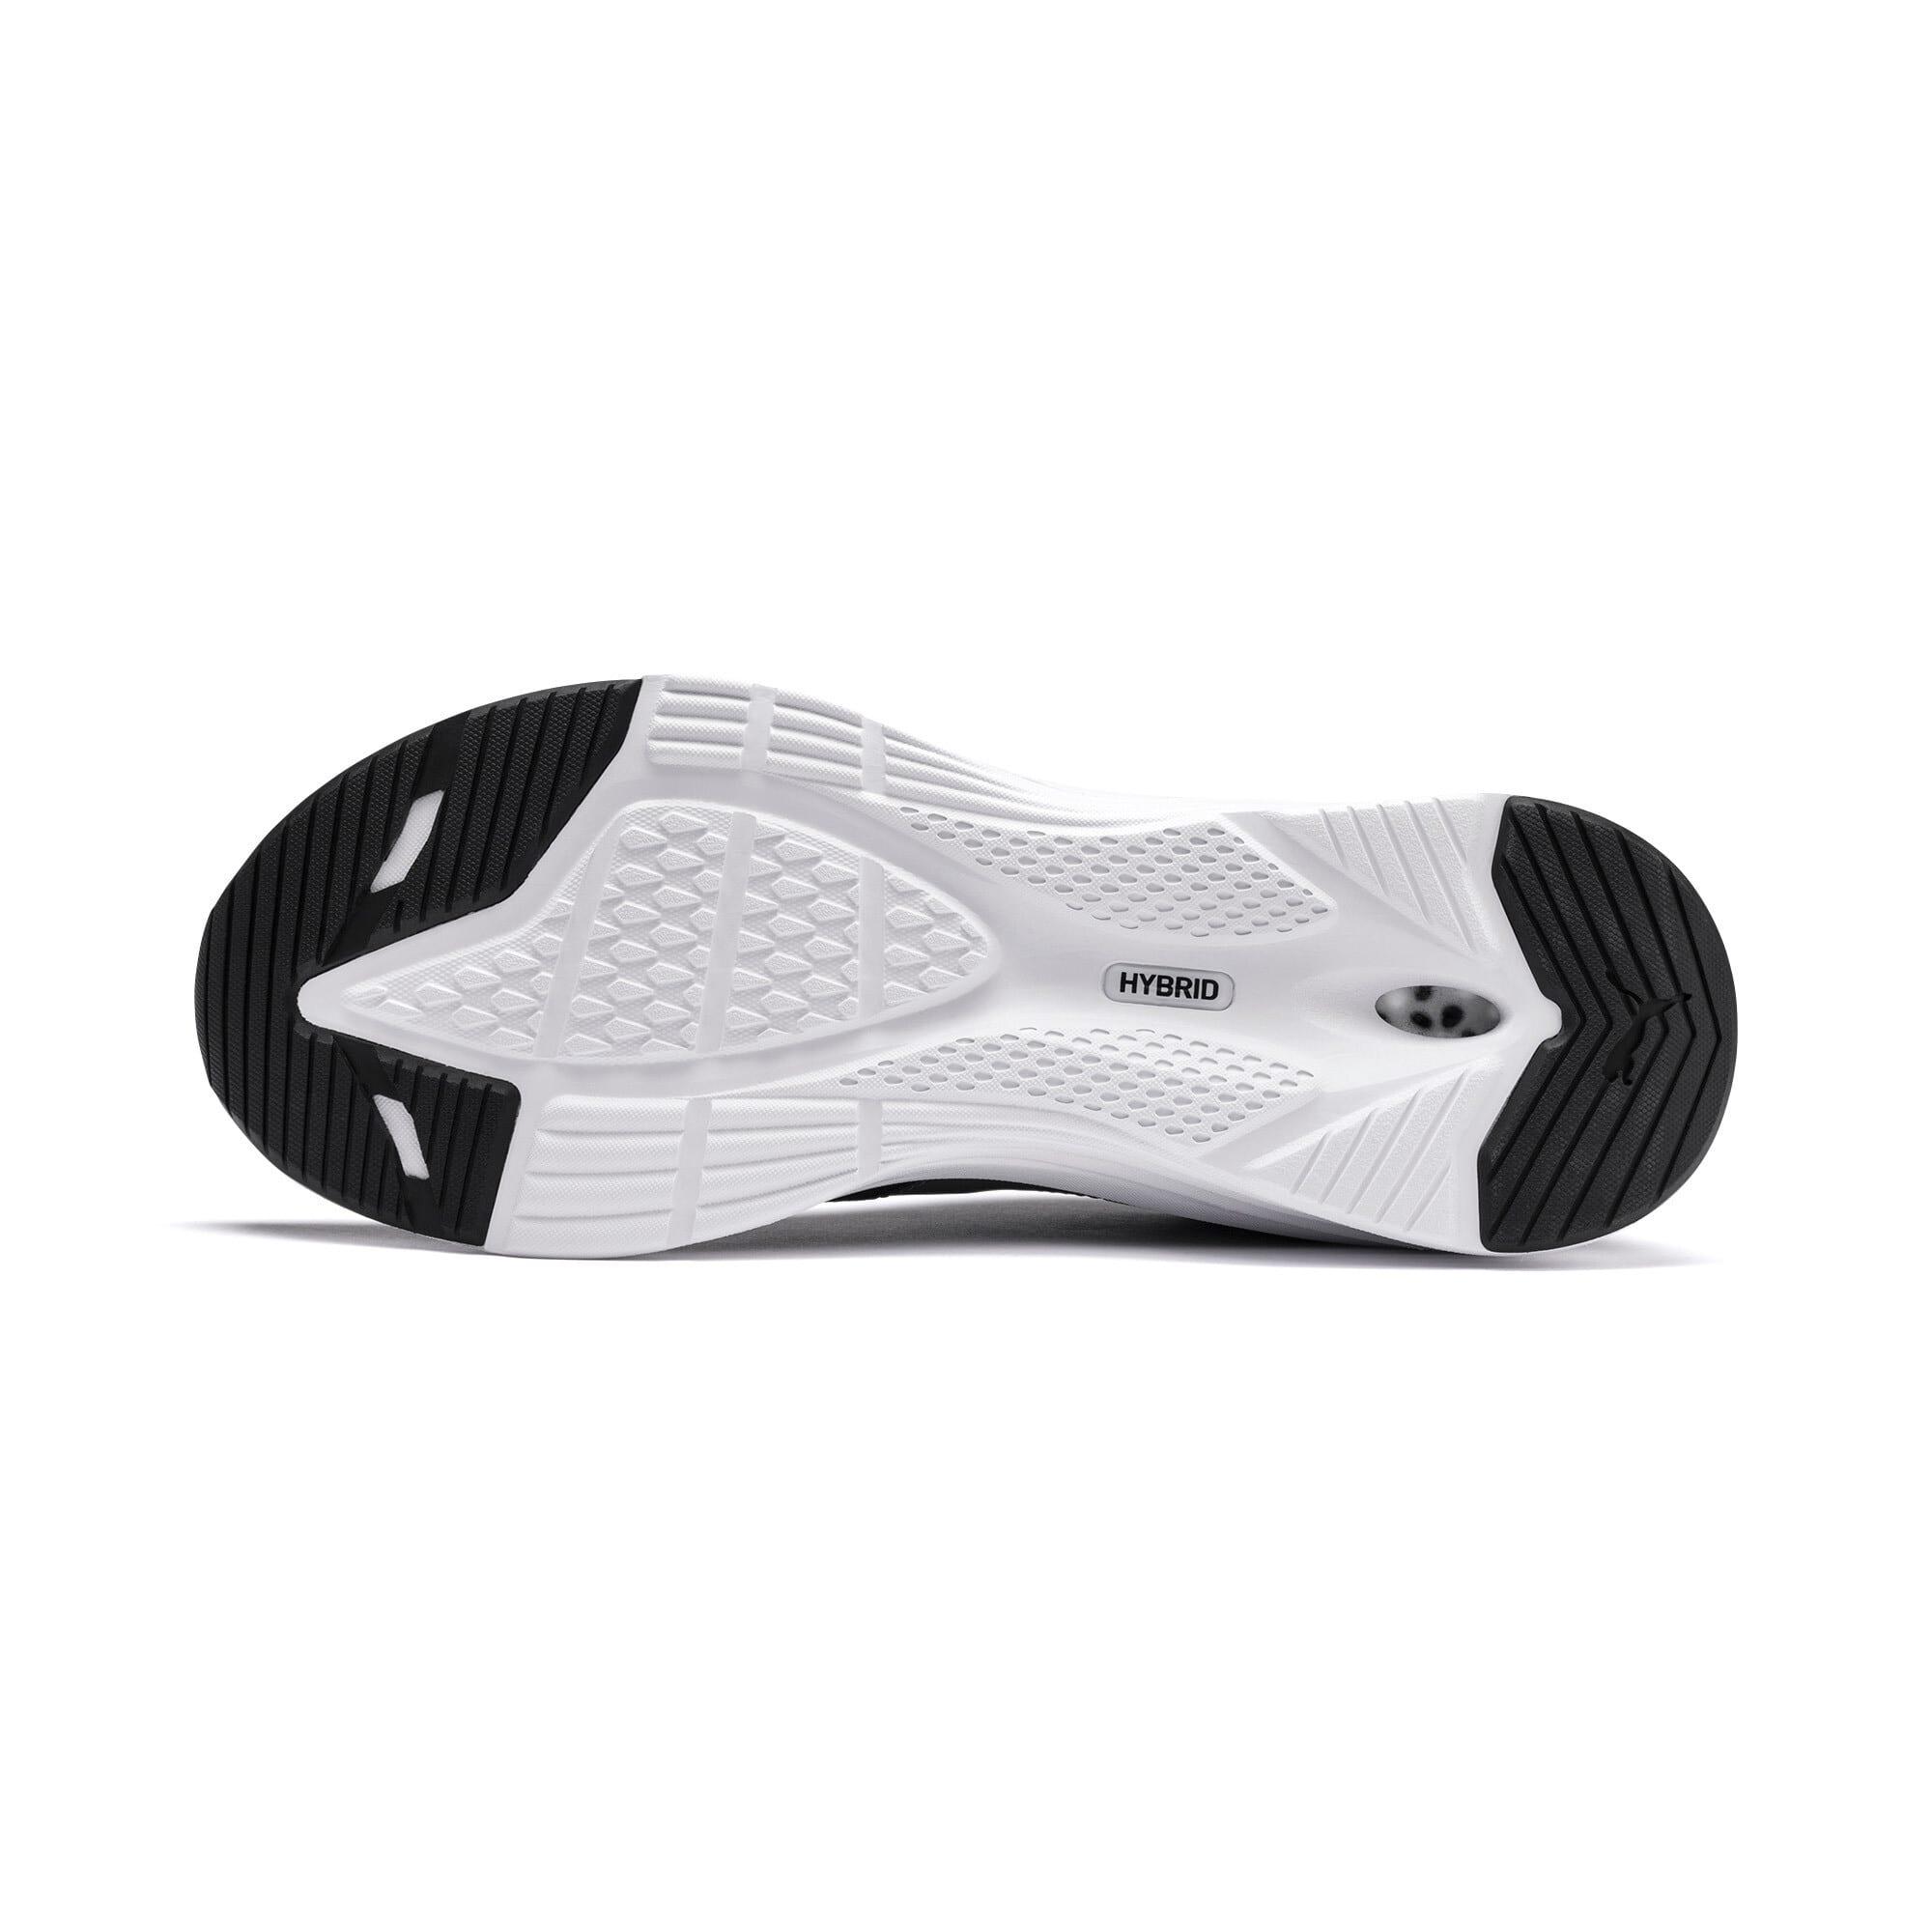 Thumbnail 5 of HYBRID Fuego Men's Running Shoes, Puma Black-Puma White, medium